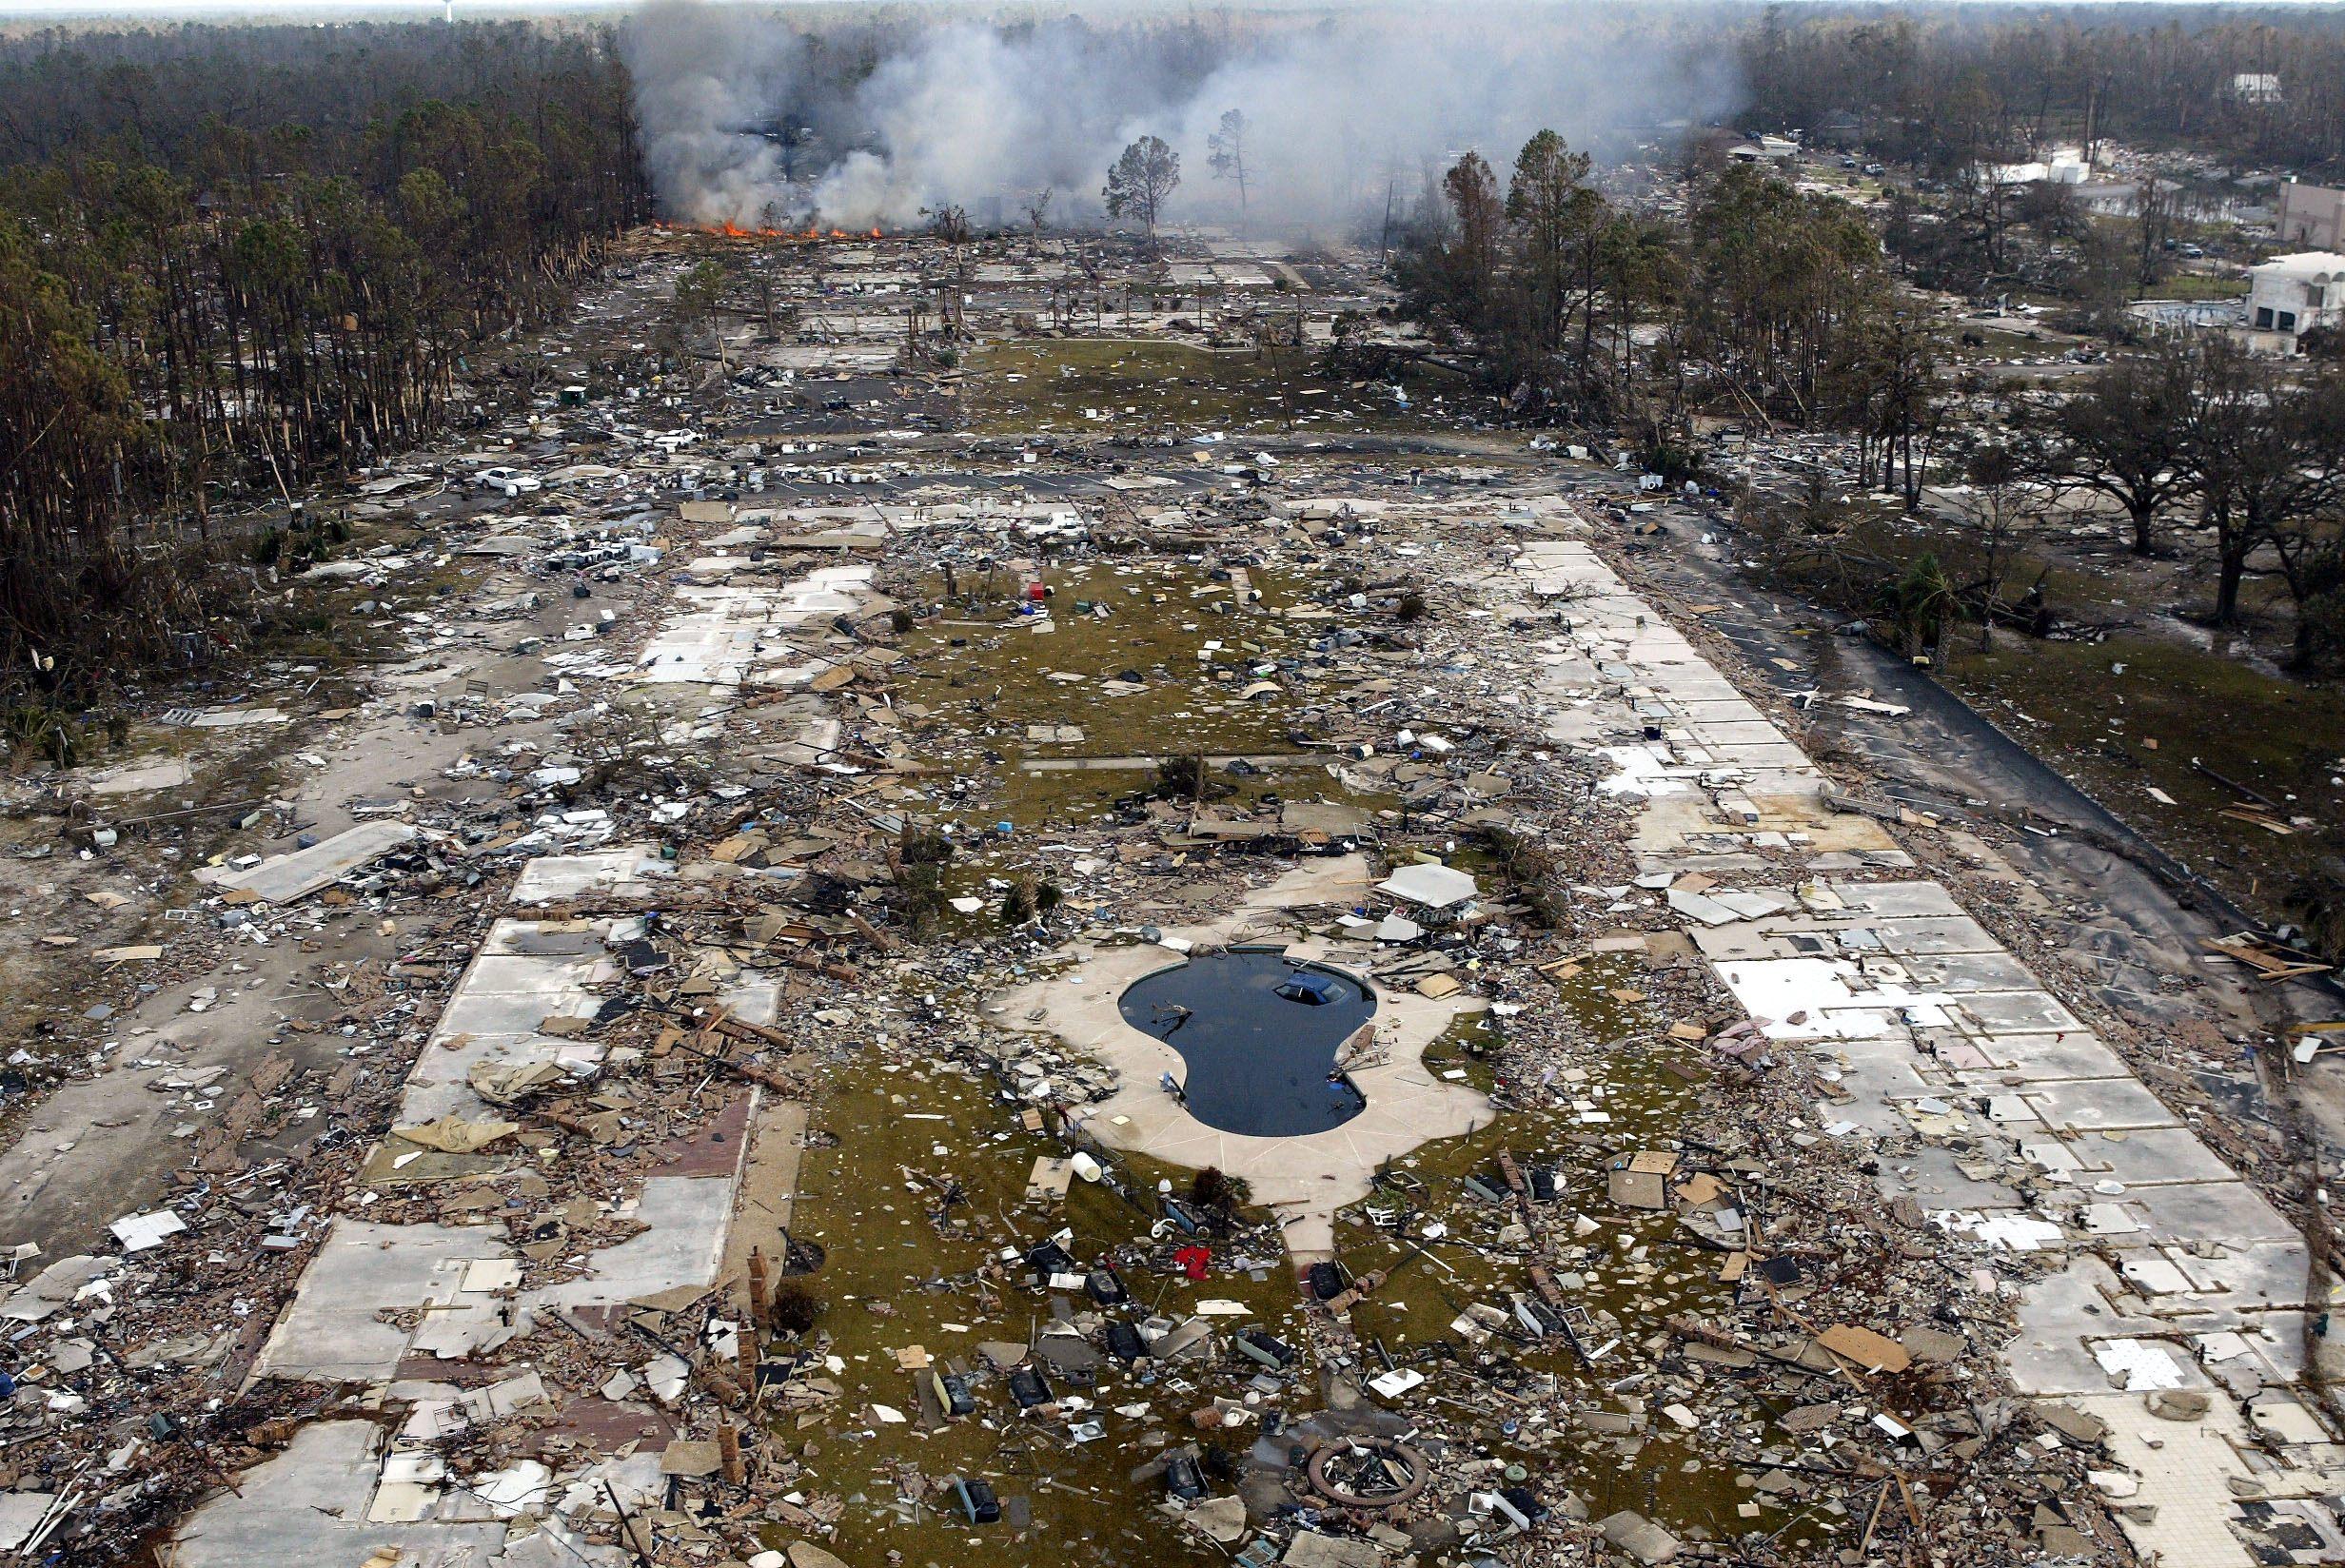 Essay on Media Coverage on Hurricane Katrina